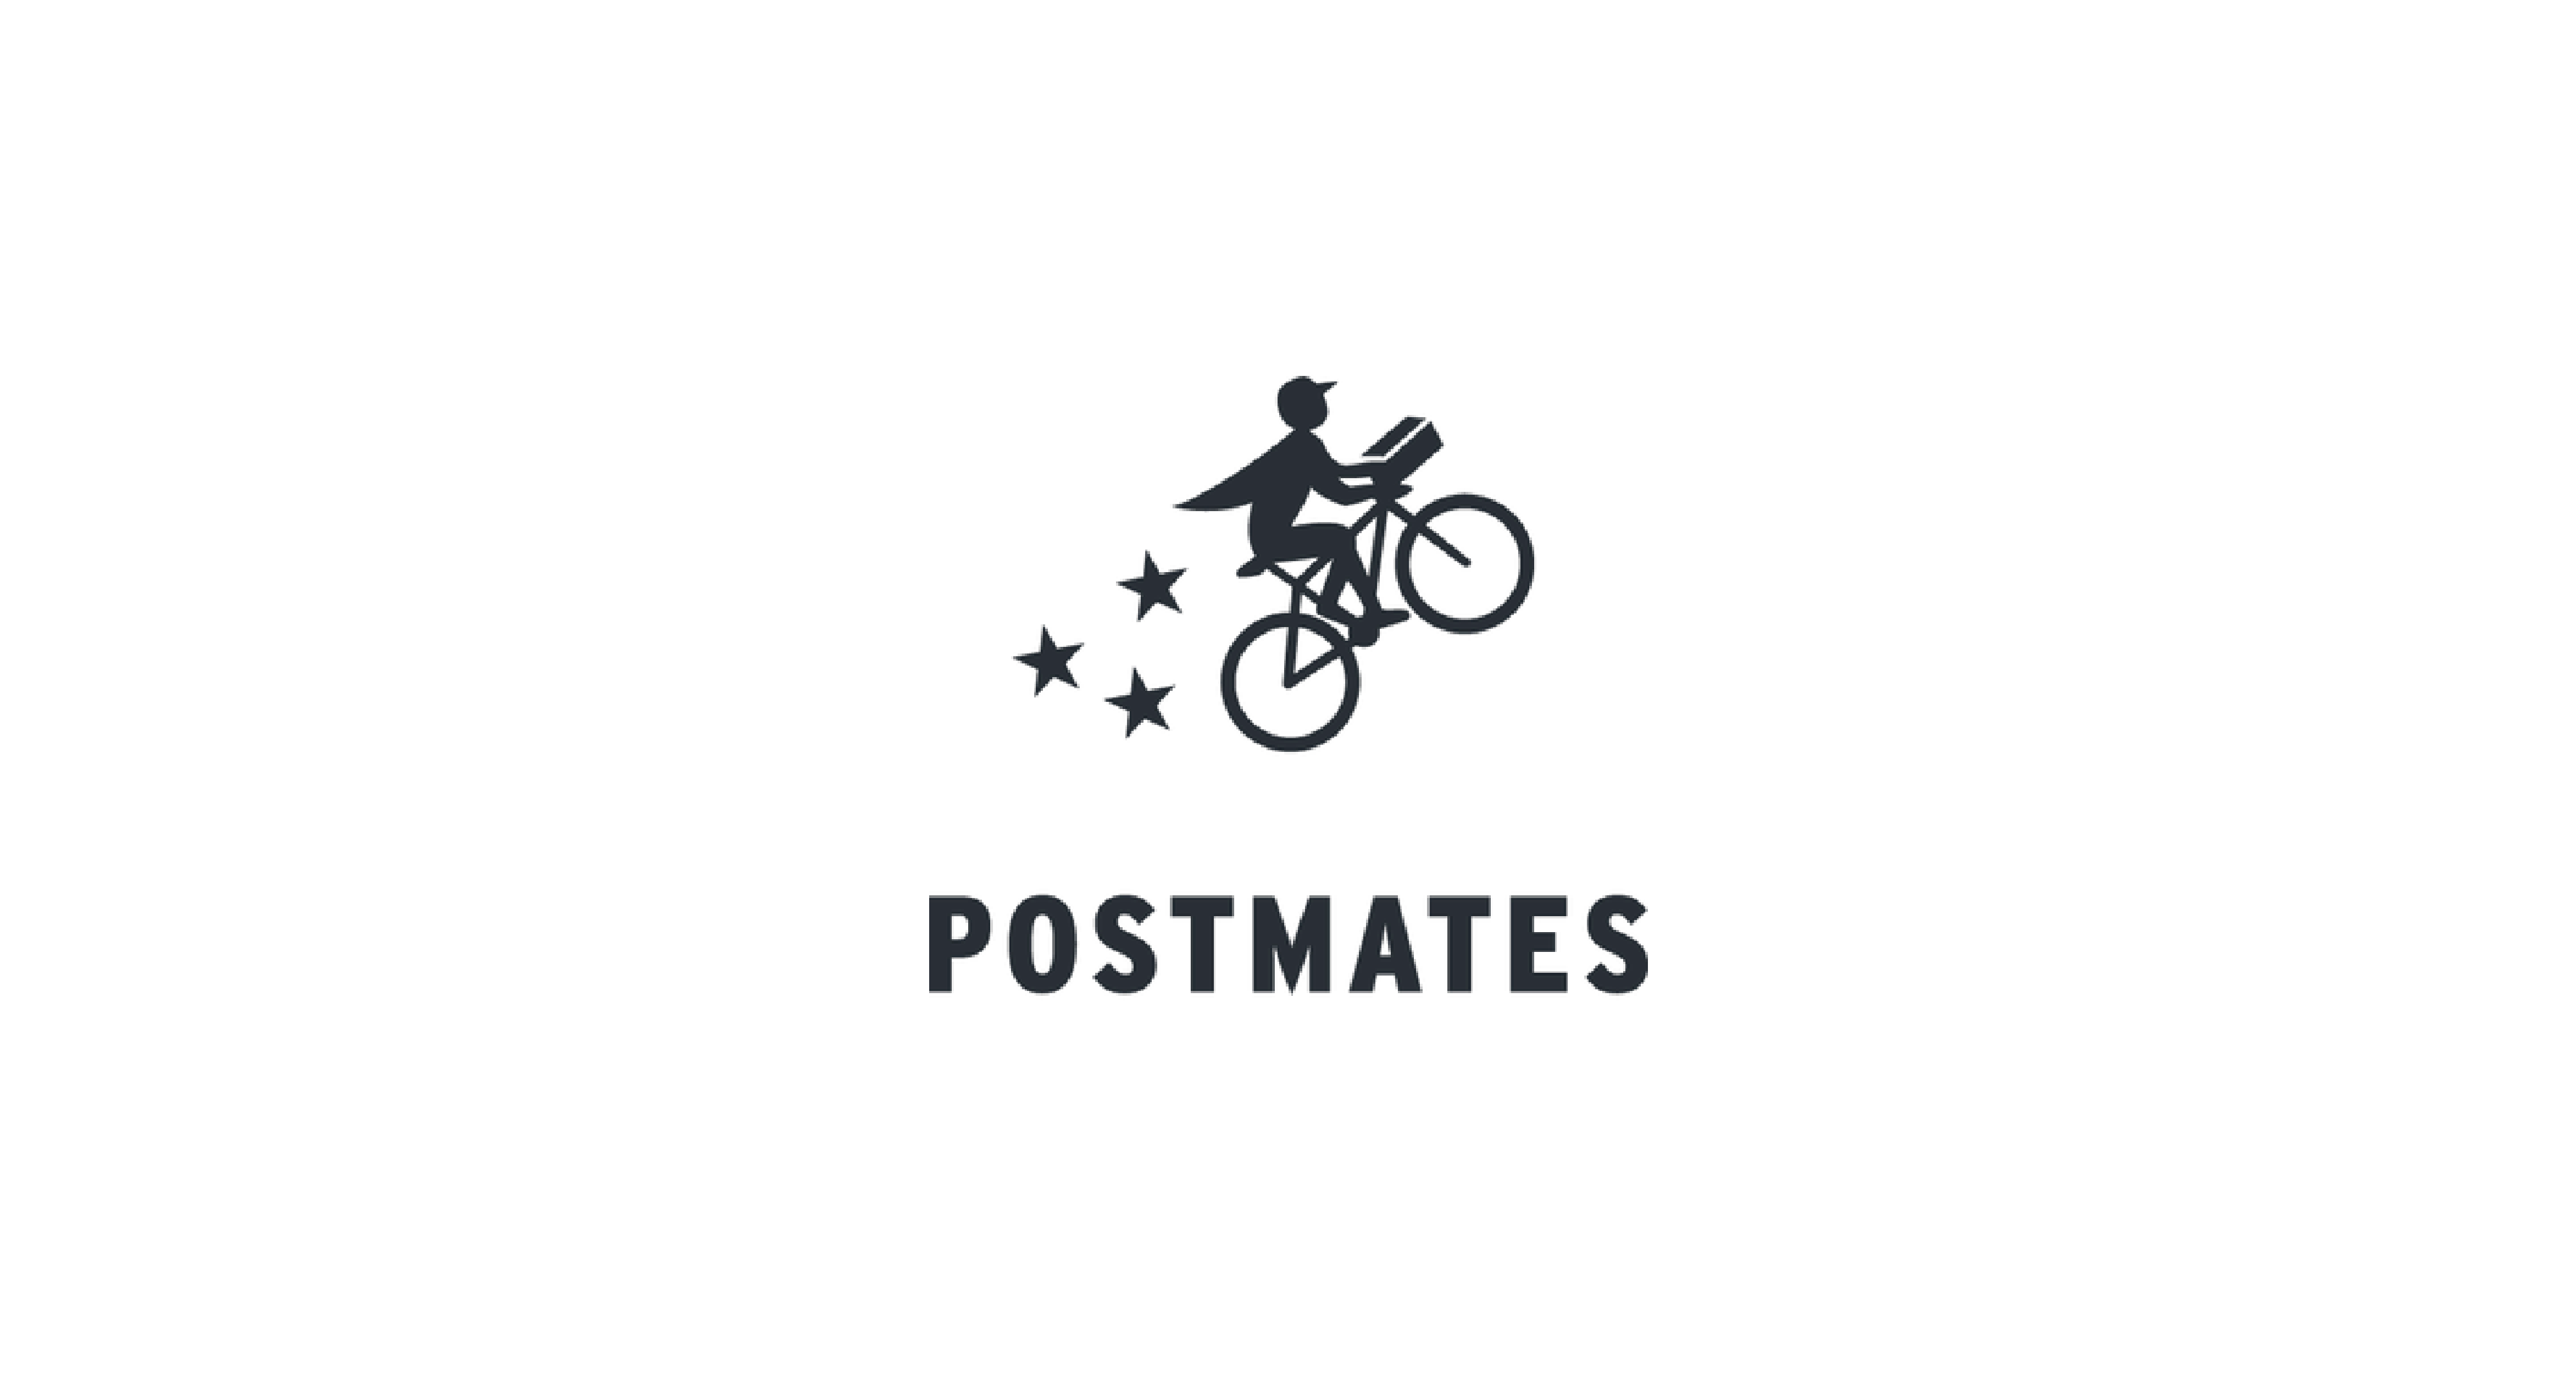 postmates - photo #13